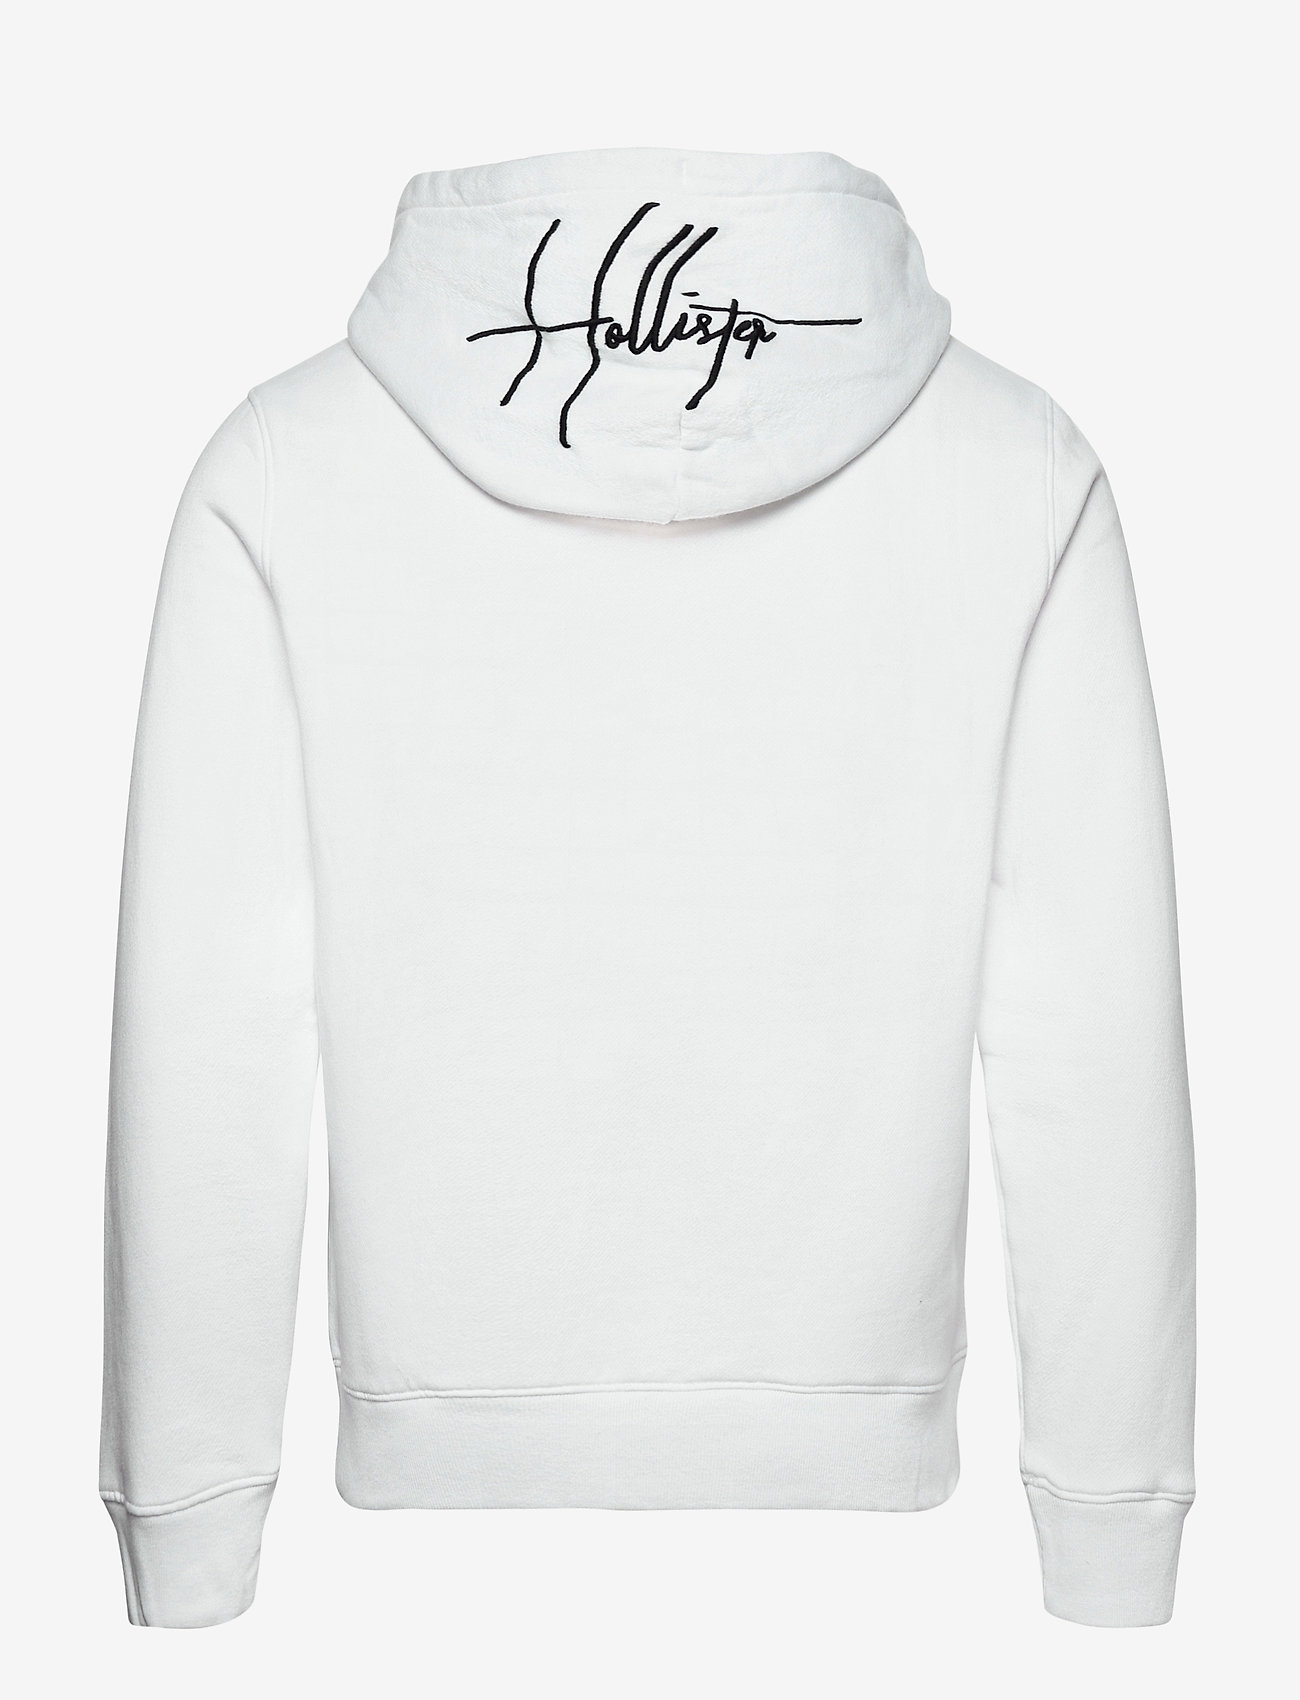 Hollister HCo. GUYS SWEATSHIRTS - Sweatshirts WHITE - Menn Klær